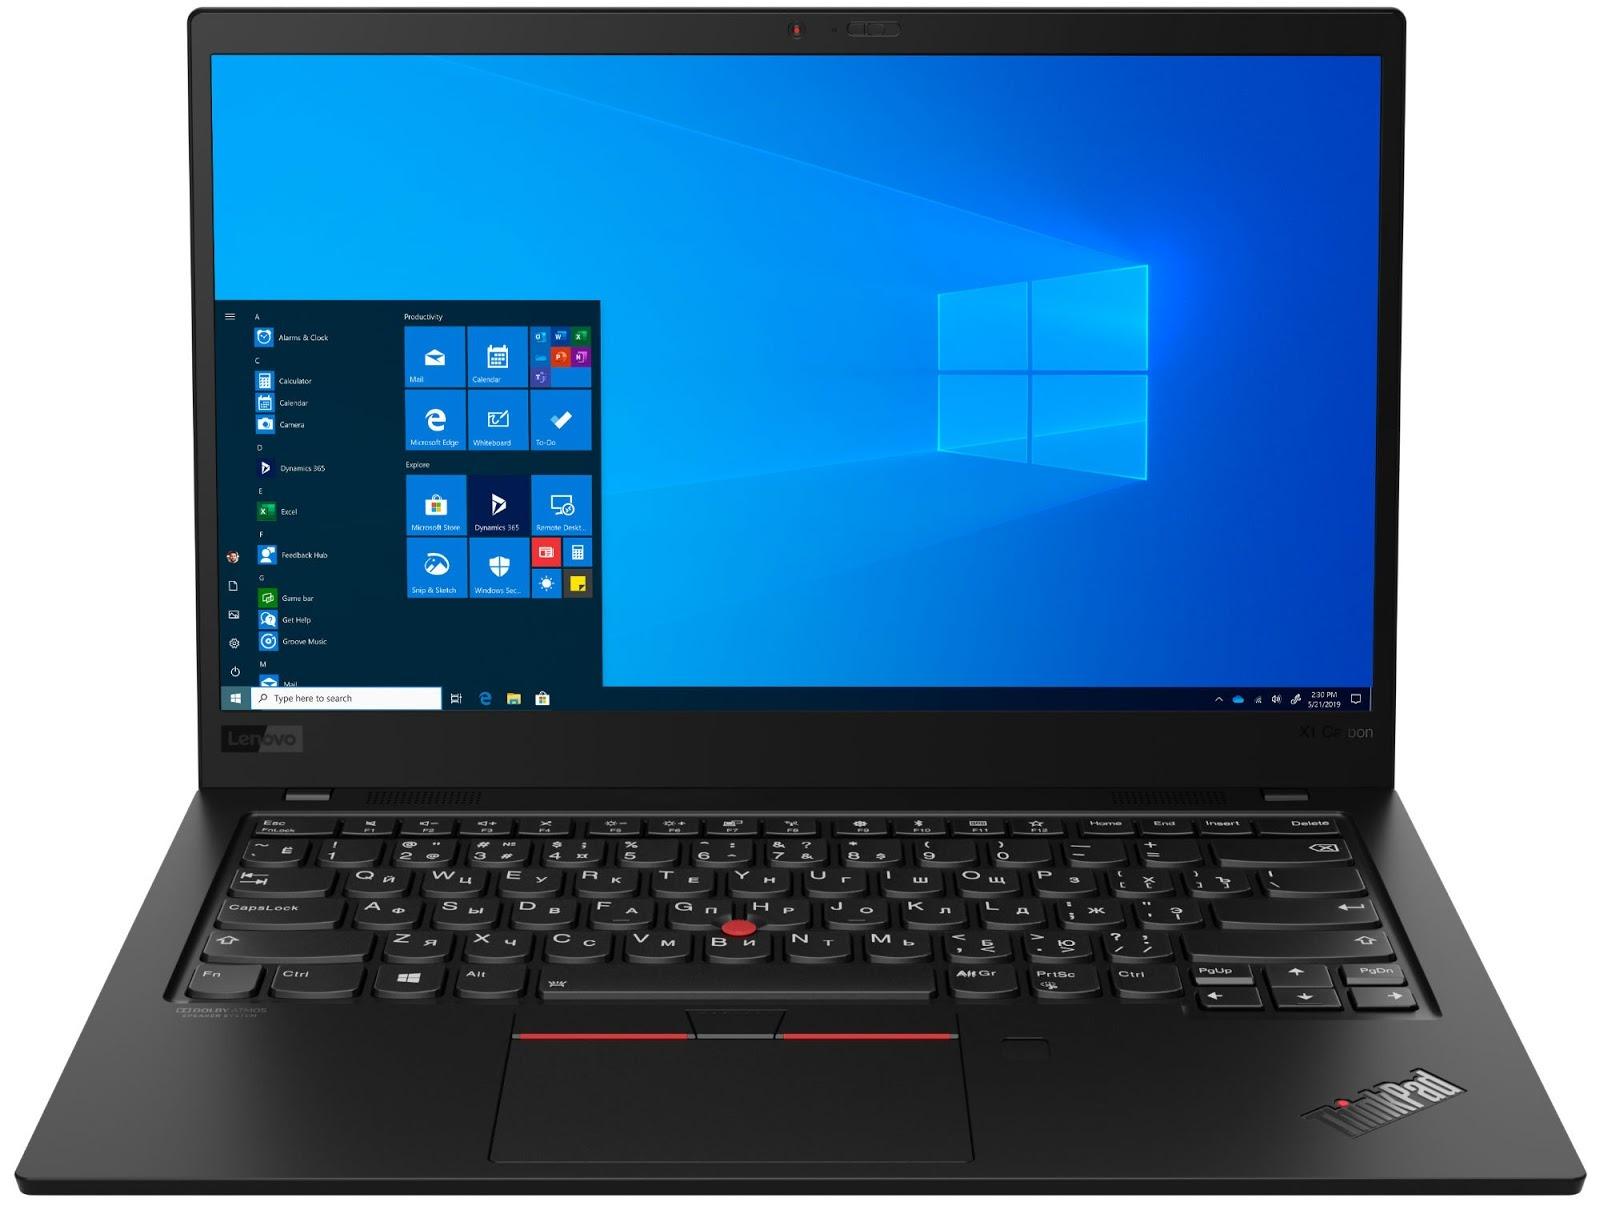 Фото 4. Lenovo ThinkPad X1 Carbon 7th Gen Black (20QD003DRT)